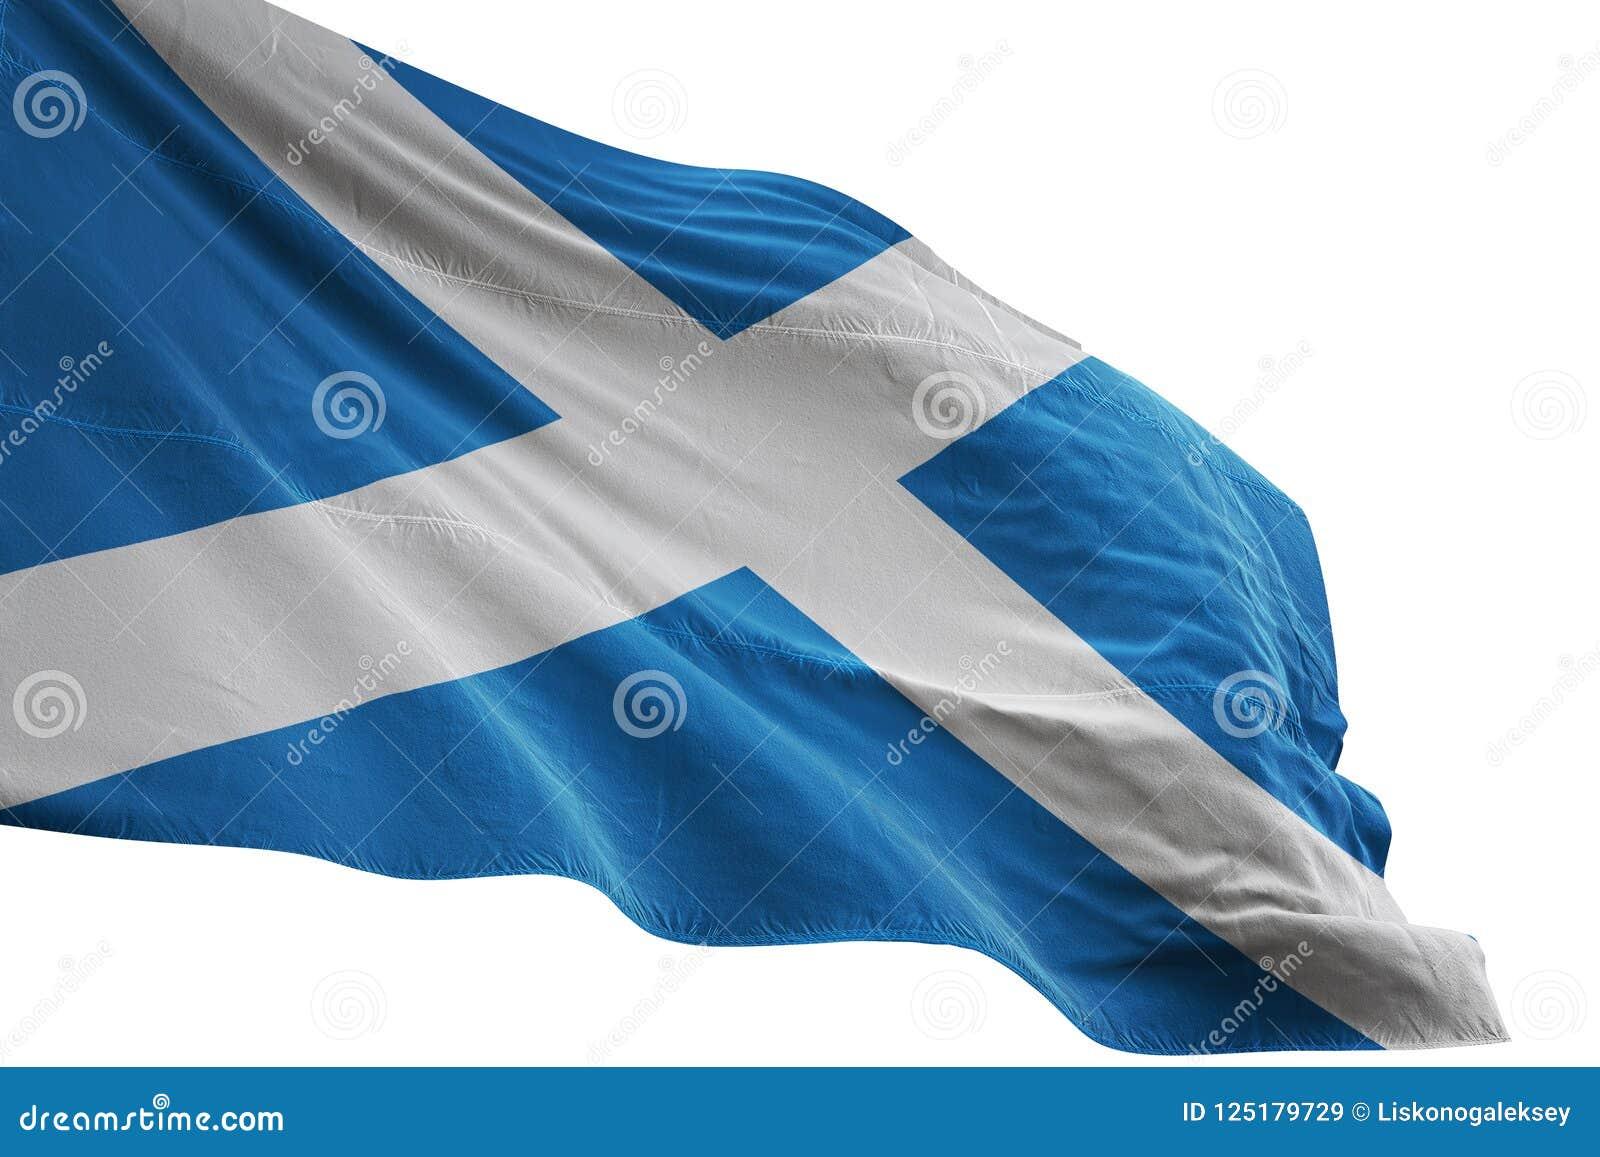 Scotland national flag waving isolated on white background 3d illustration